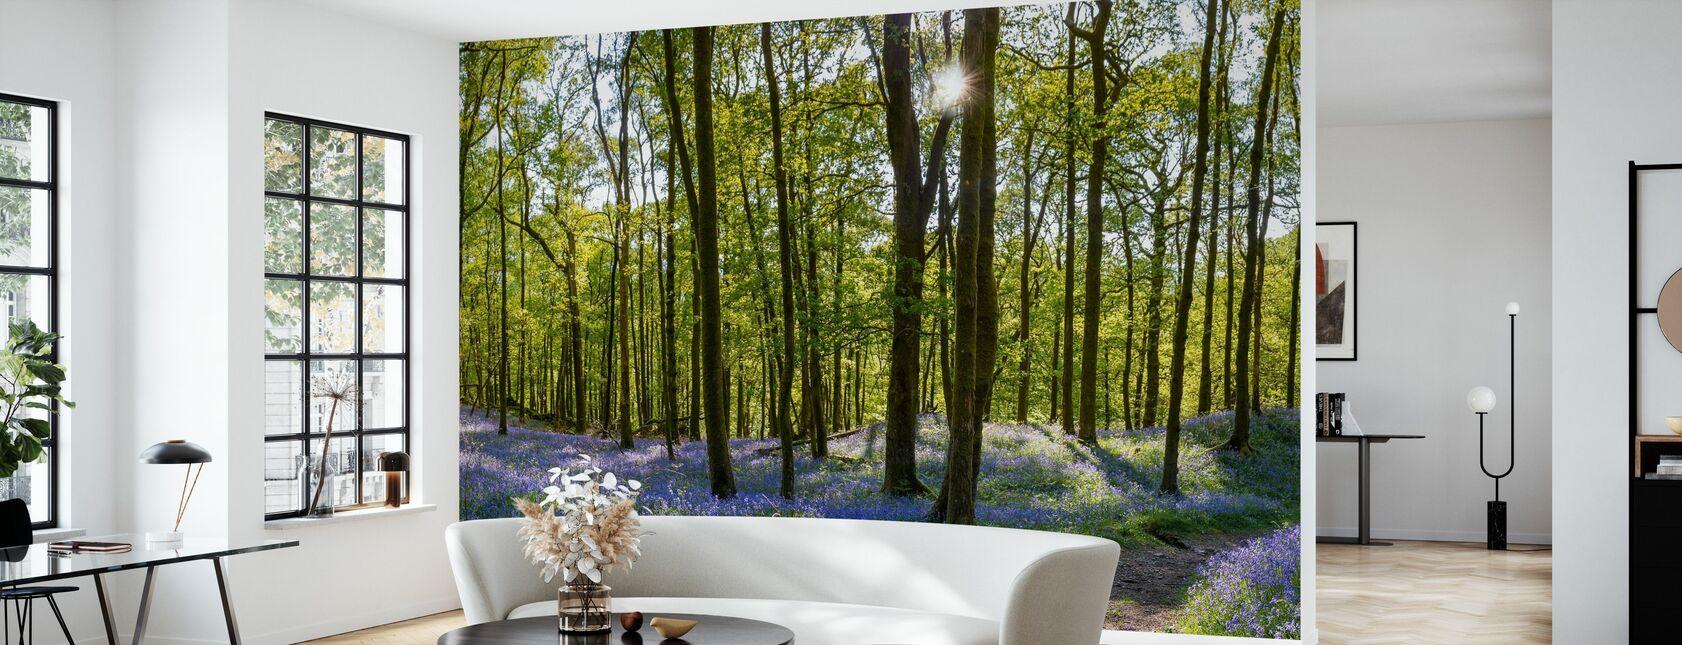 Bluebell Carpets on Woodland - Wallpaper - Living Room